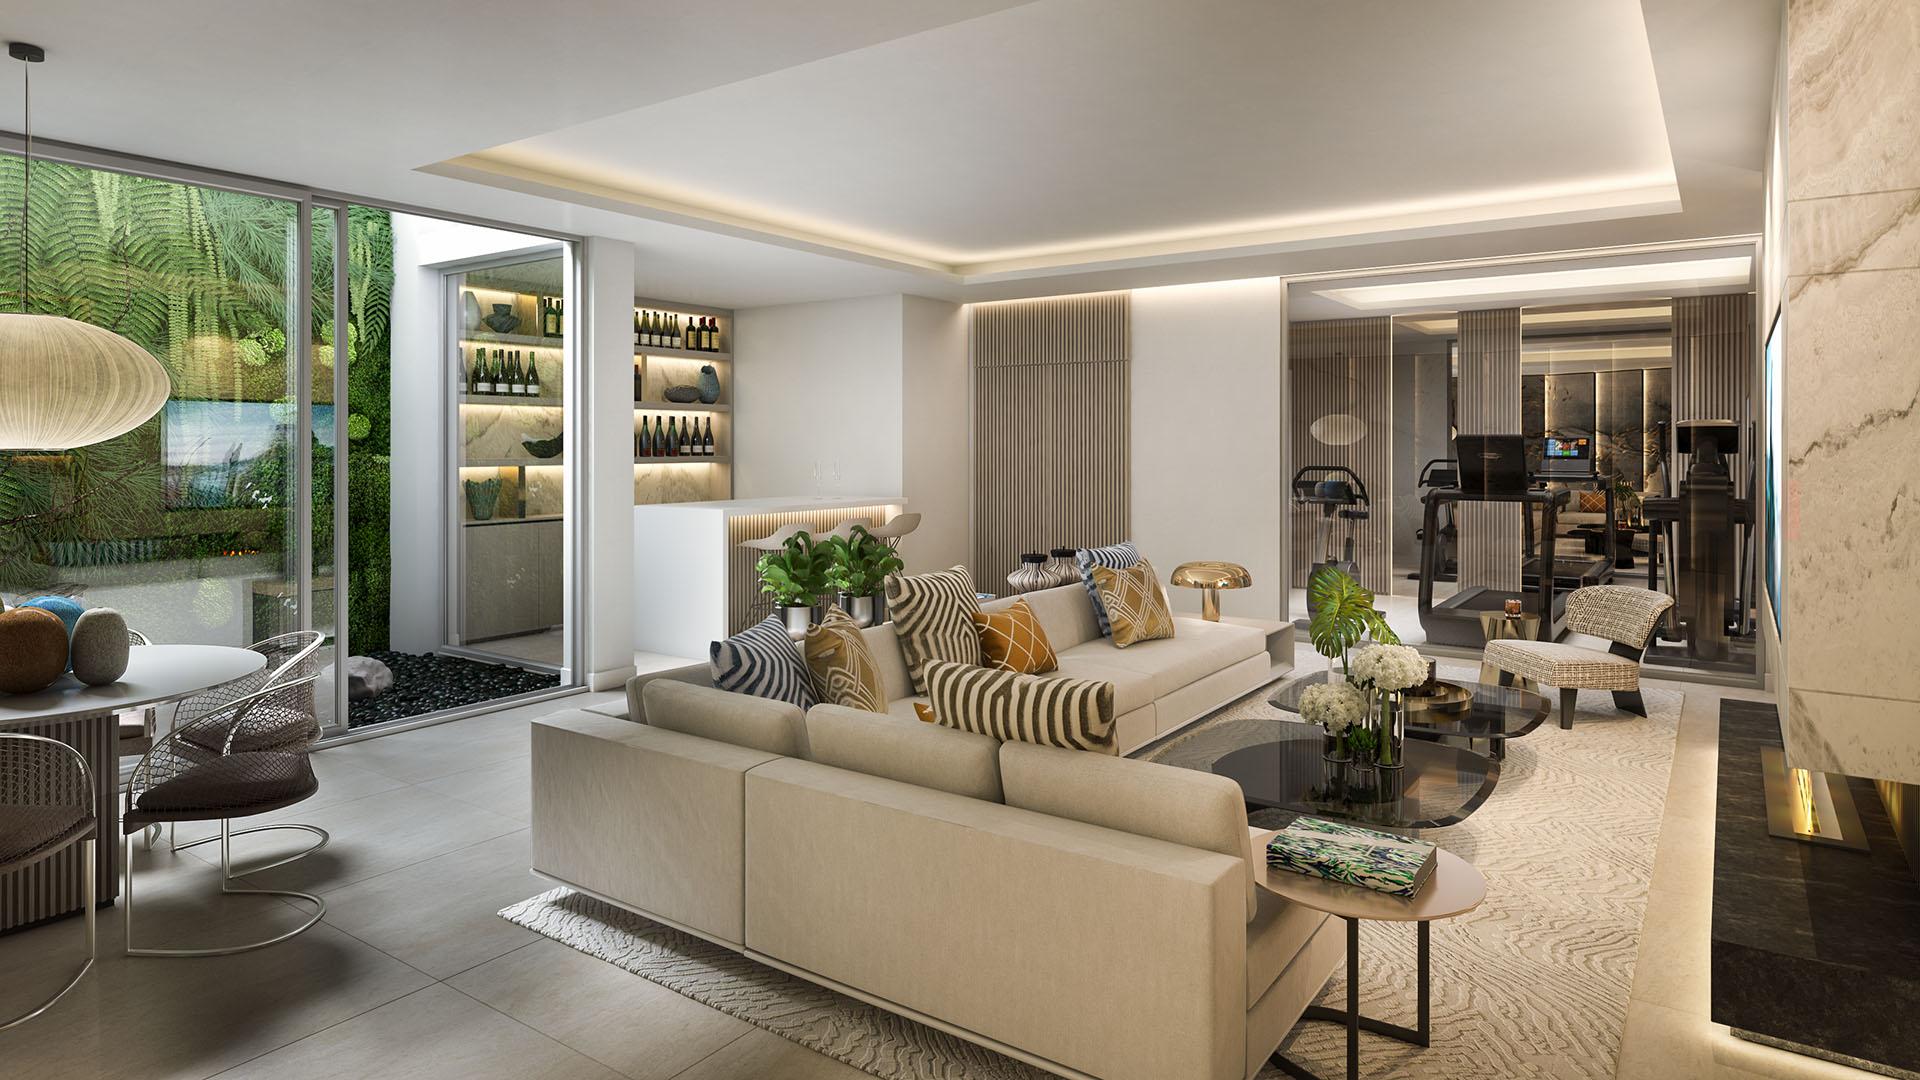 Celeste Marbella: Luxury development in the heart of Nueva Andalucía, Marbella